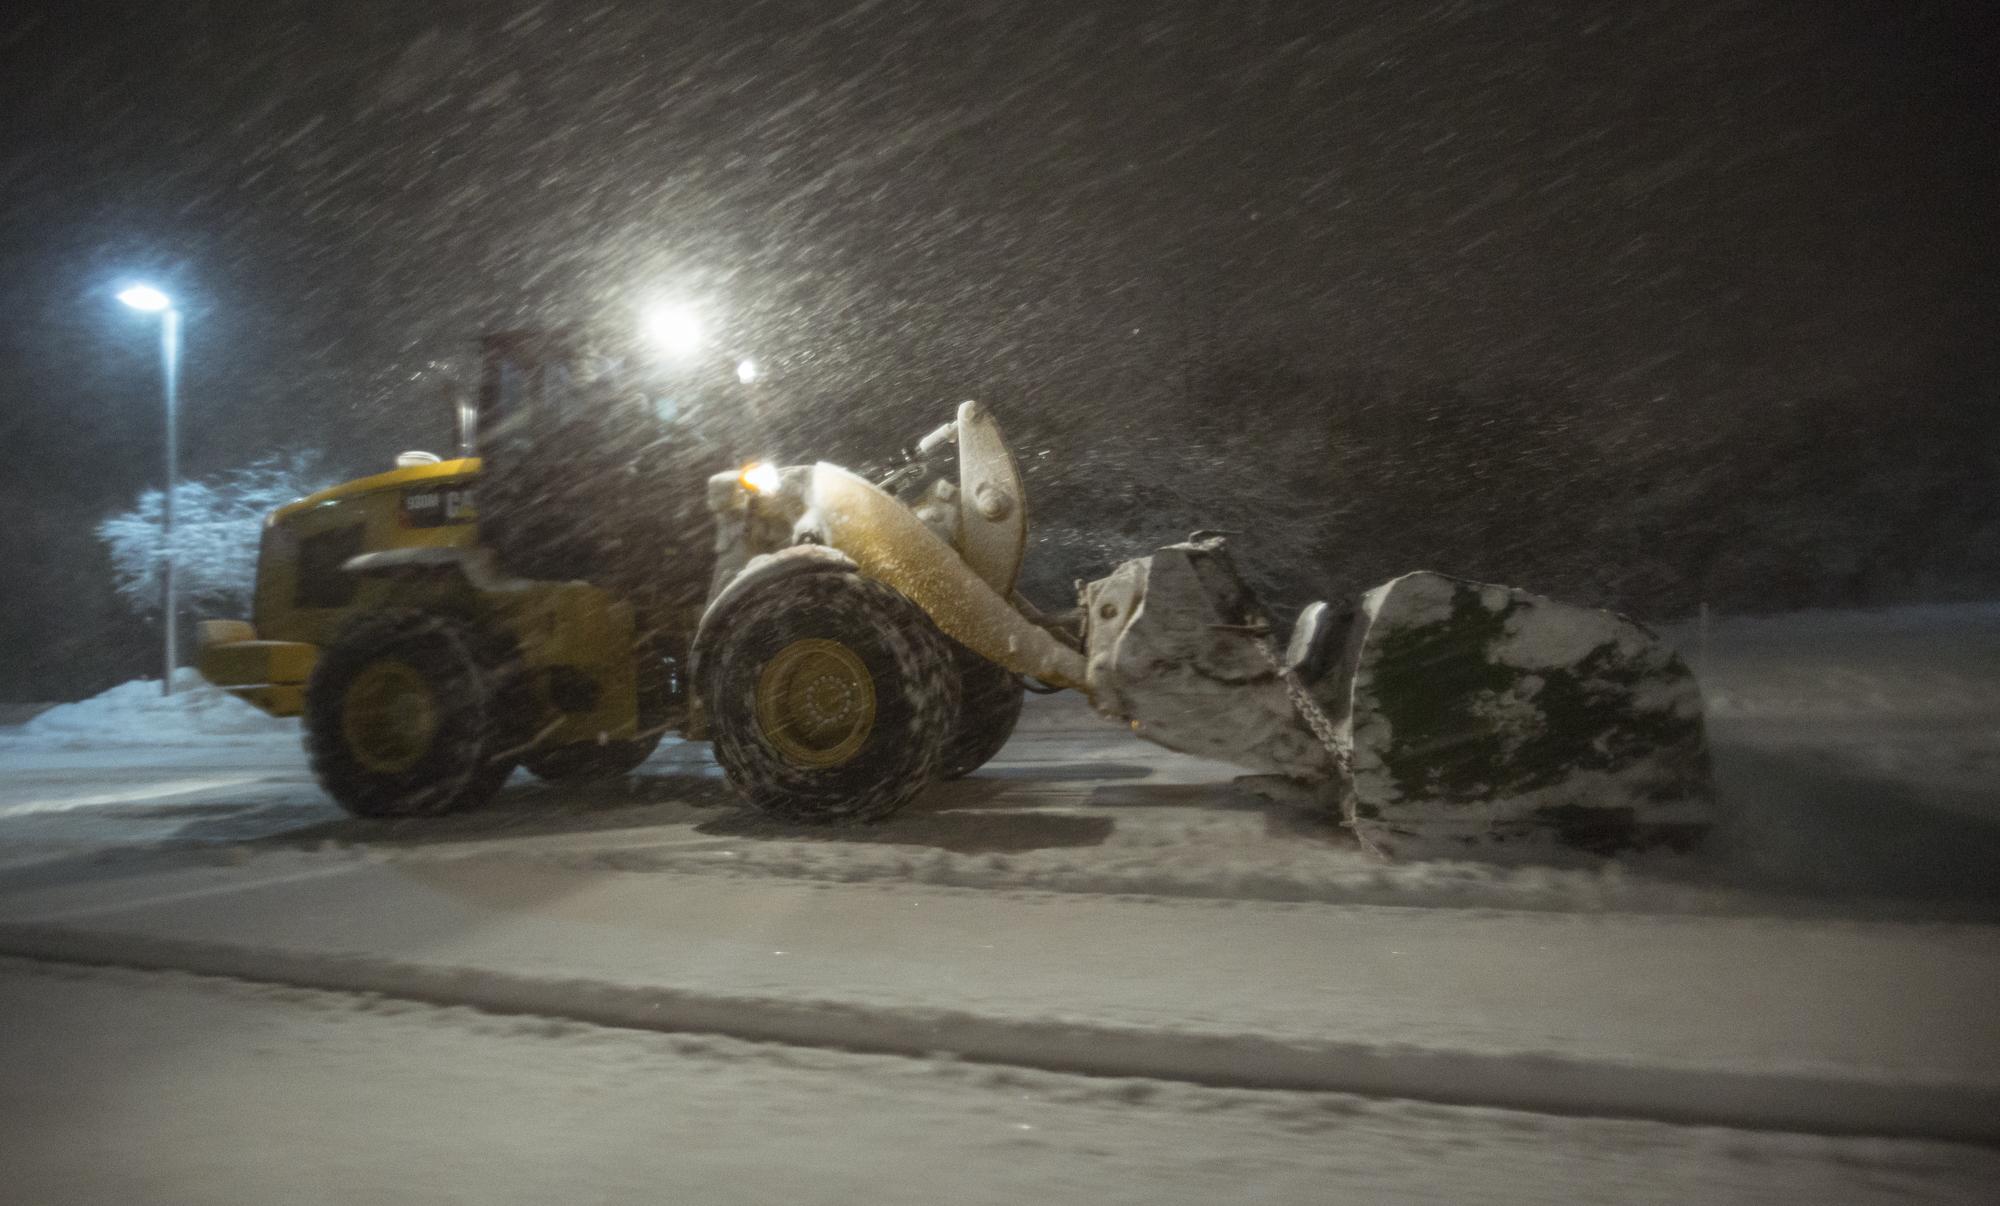 Heavy Equipment Used to Plow Snow